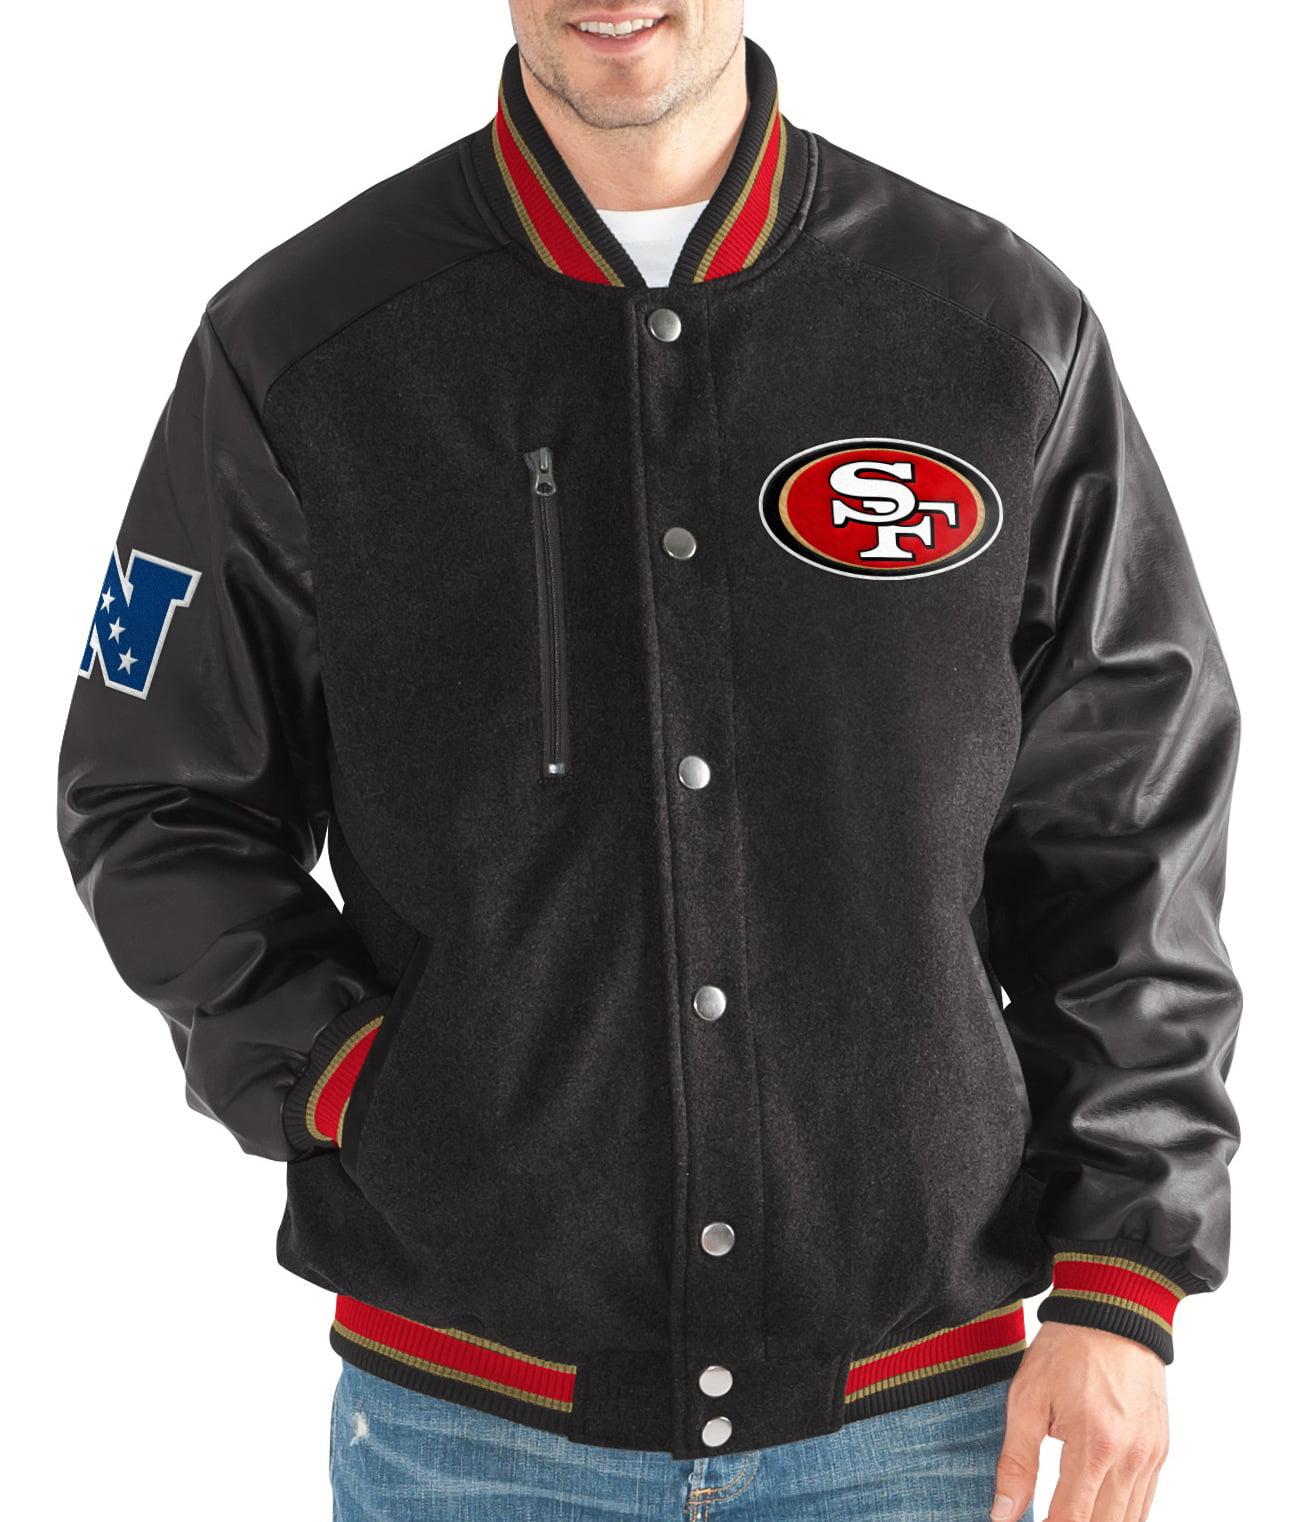 "San Francisco 49ers G-III NFL ""Heavy Hitter"" Men's Premium Varsity Jacket by G-III Sports"